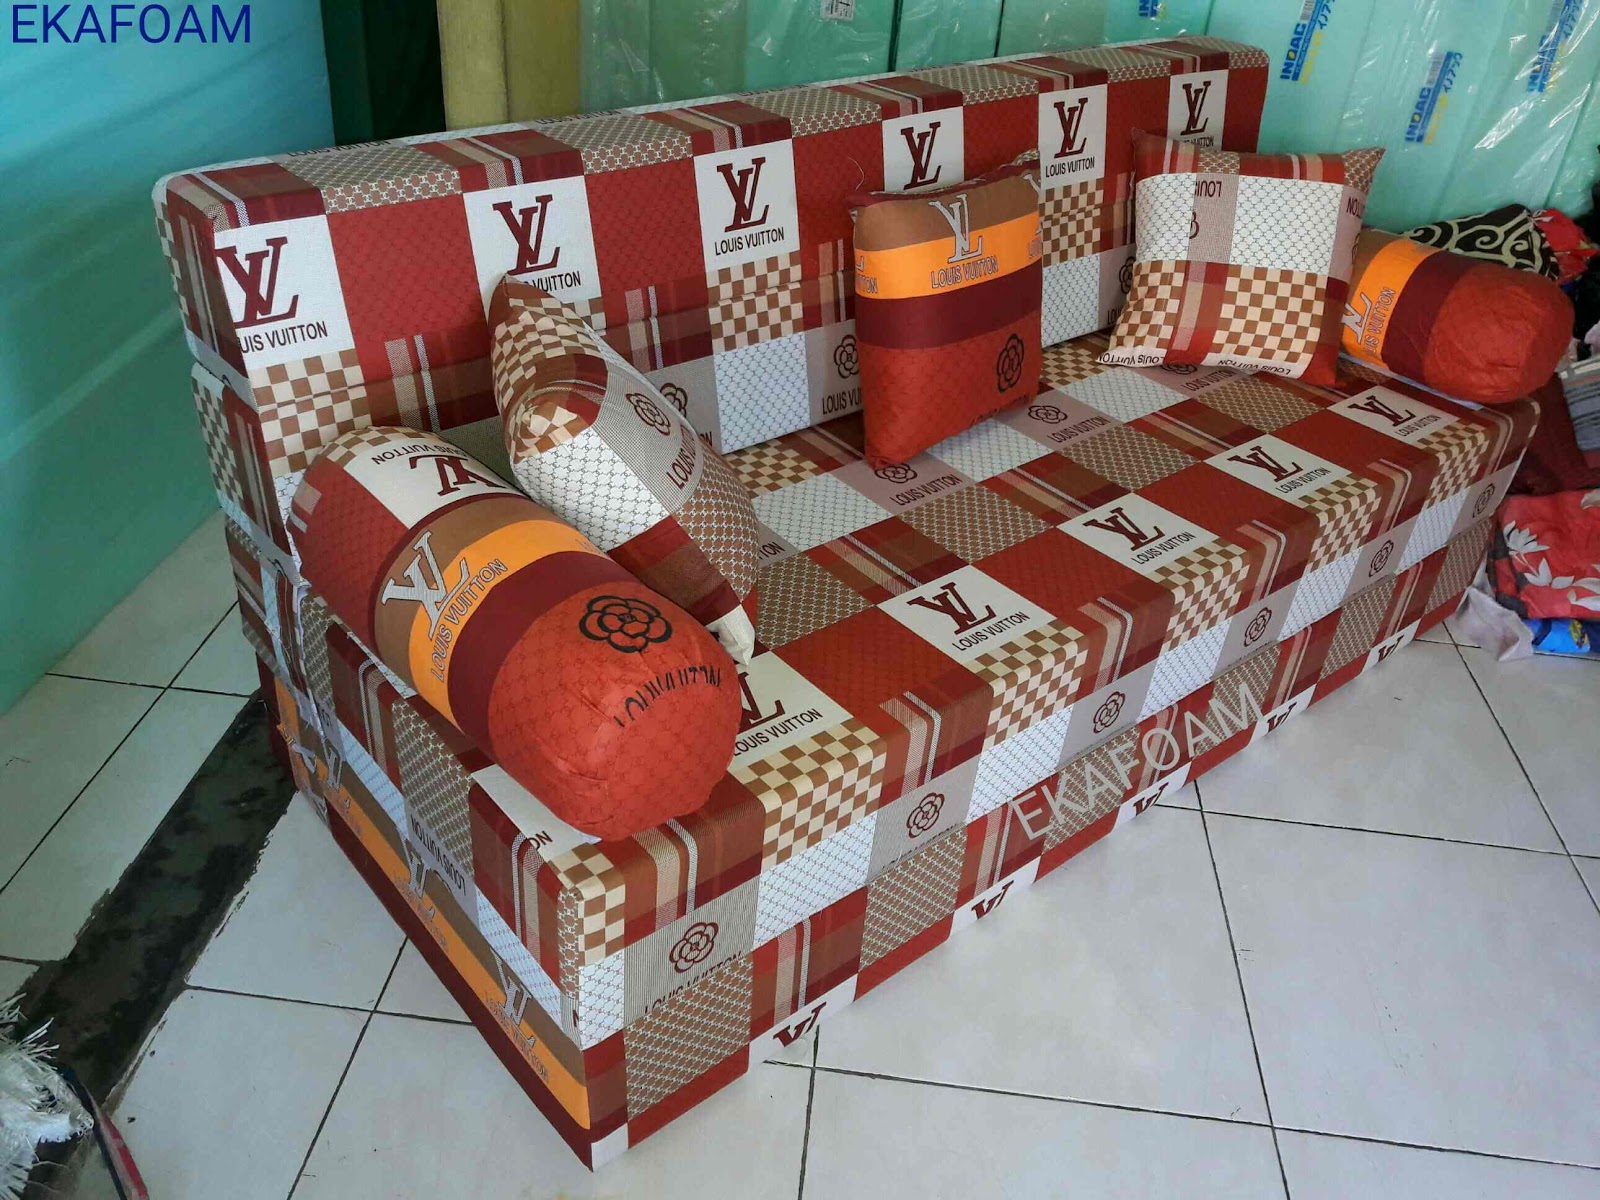 Sofa Bed Inoac 2017 Proses Pembuatan Agen Kasur Busa Inoac Tangerang